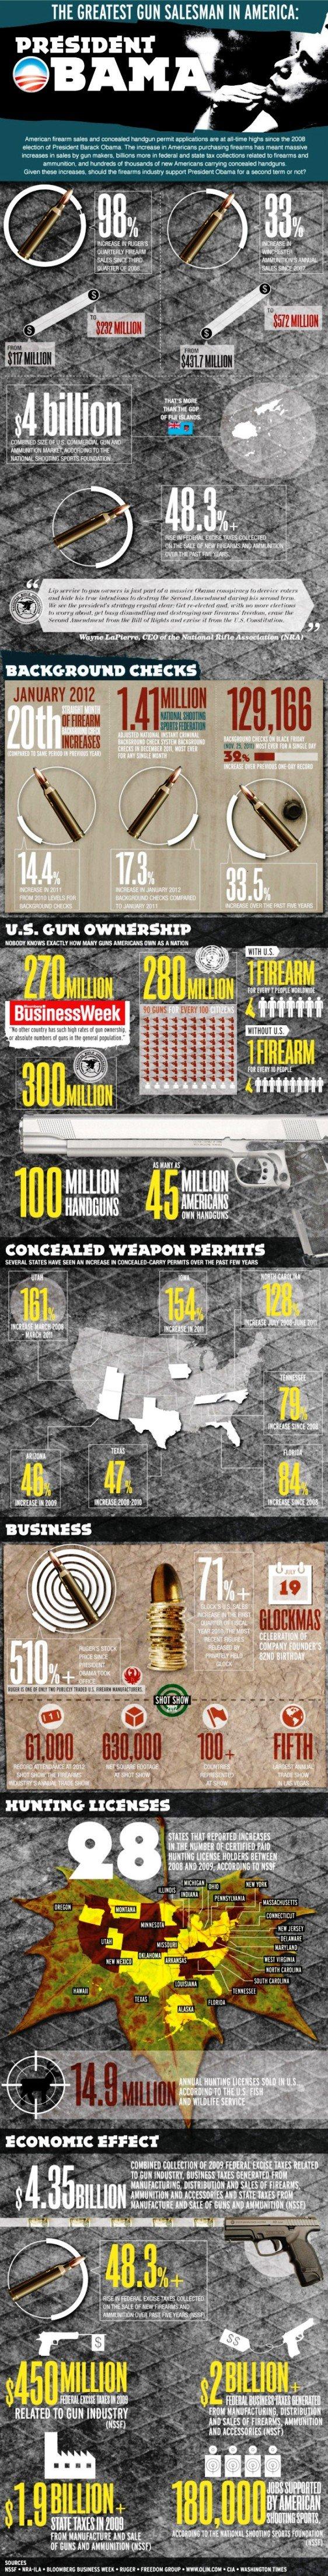 Greatest Gun Salesman In America President Obama #infographic